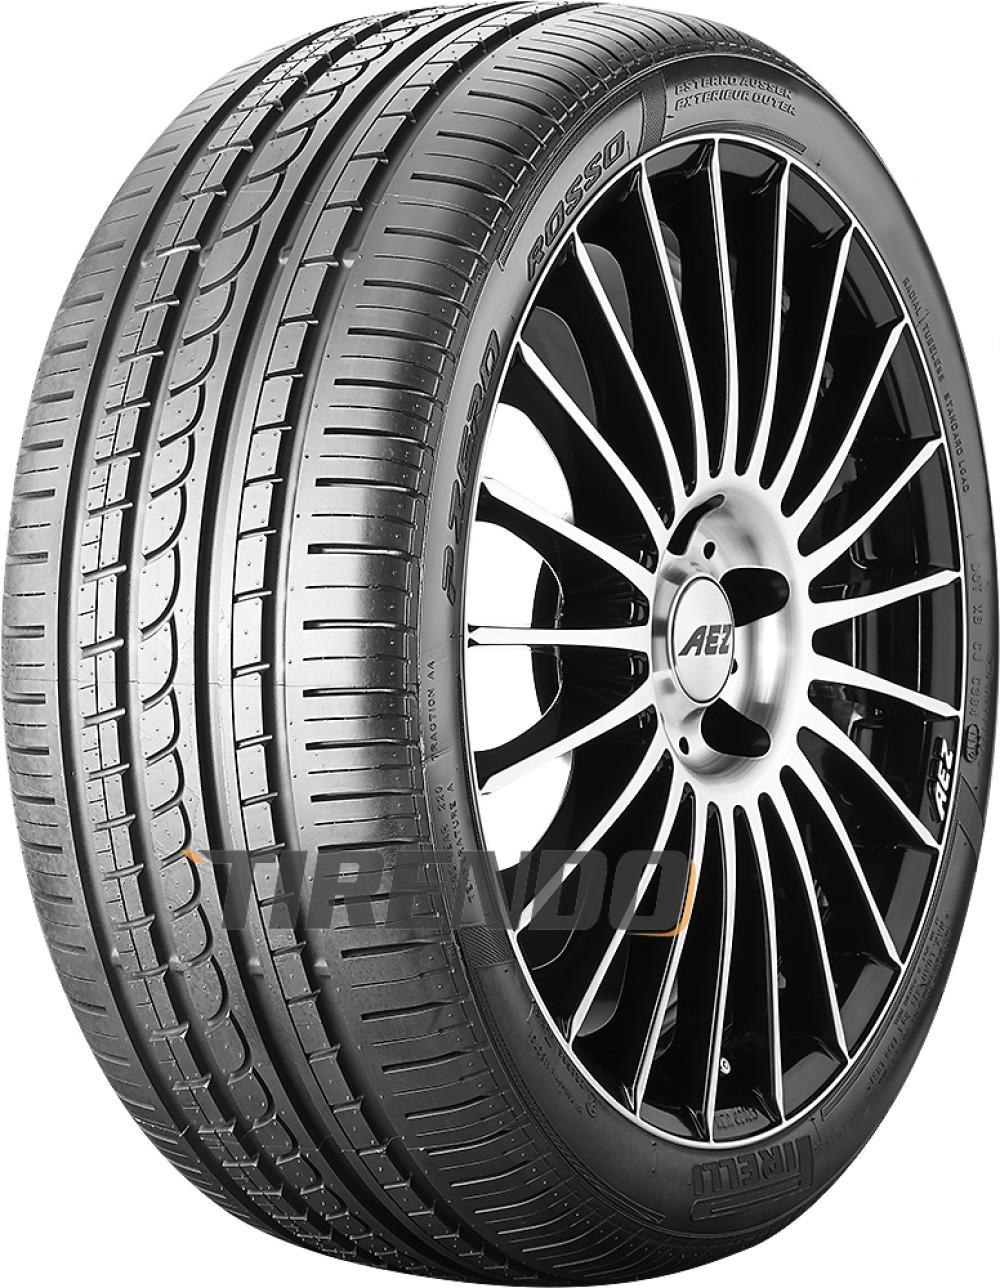 Pirelli P Zero Rosso Asimmetrico ( 335/30 ZR18 (102Y) )